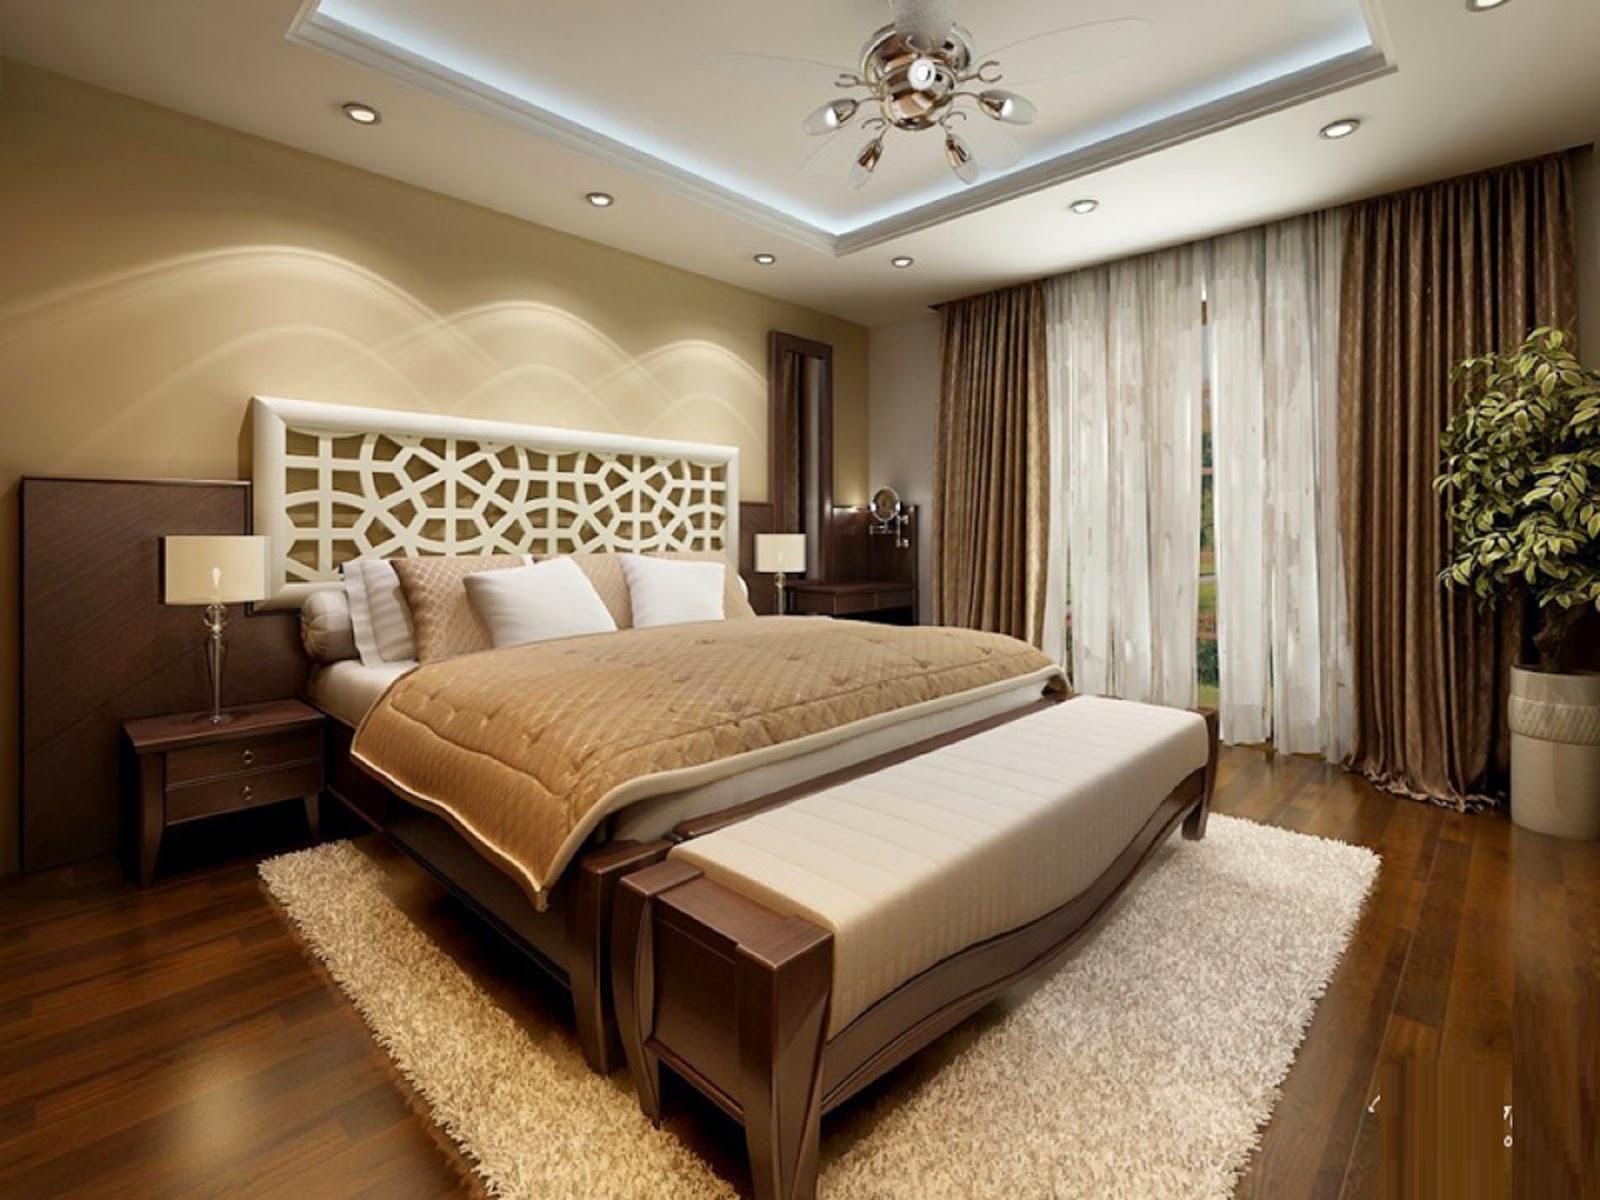 Dynamic views most beautiful bedroom interior designs for World most beautiful interior designs